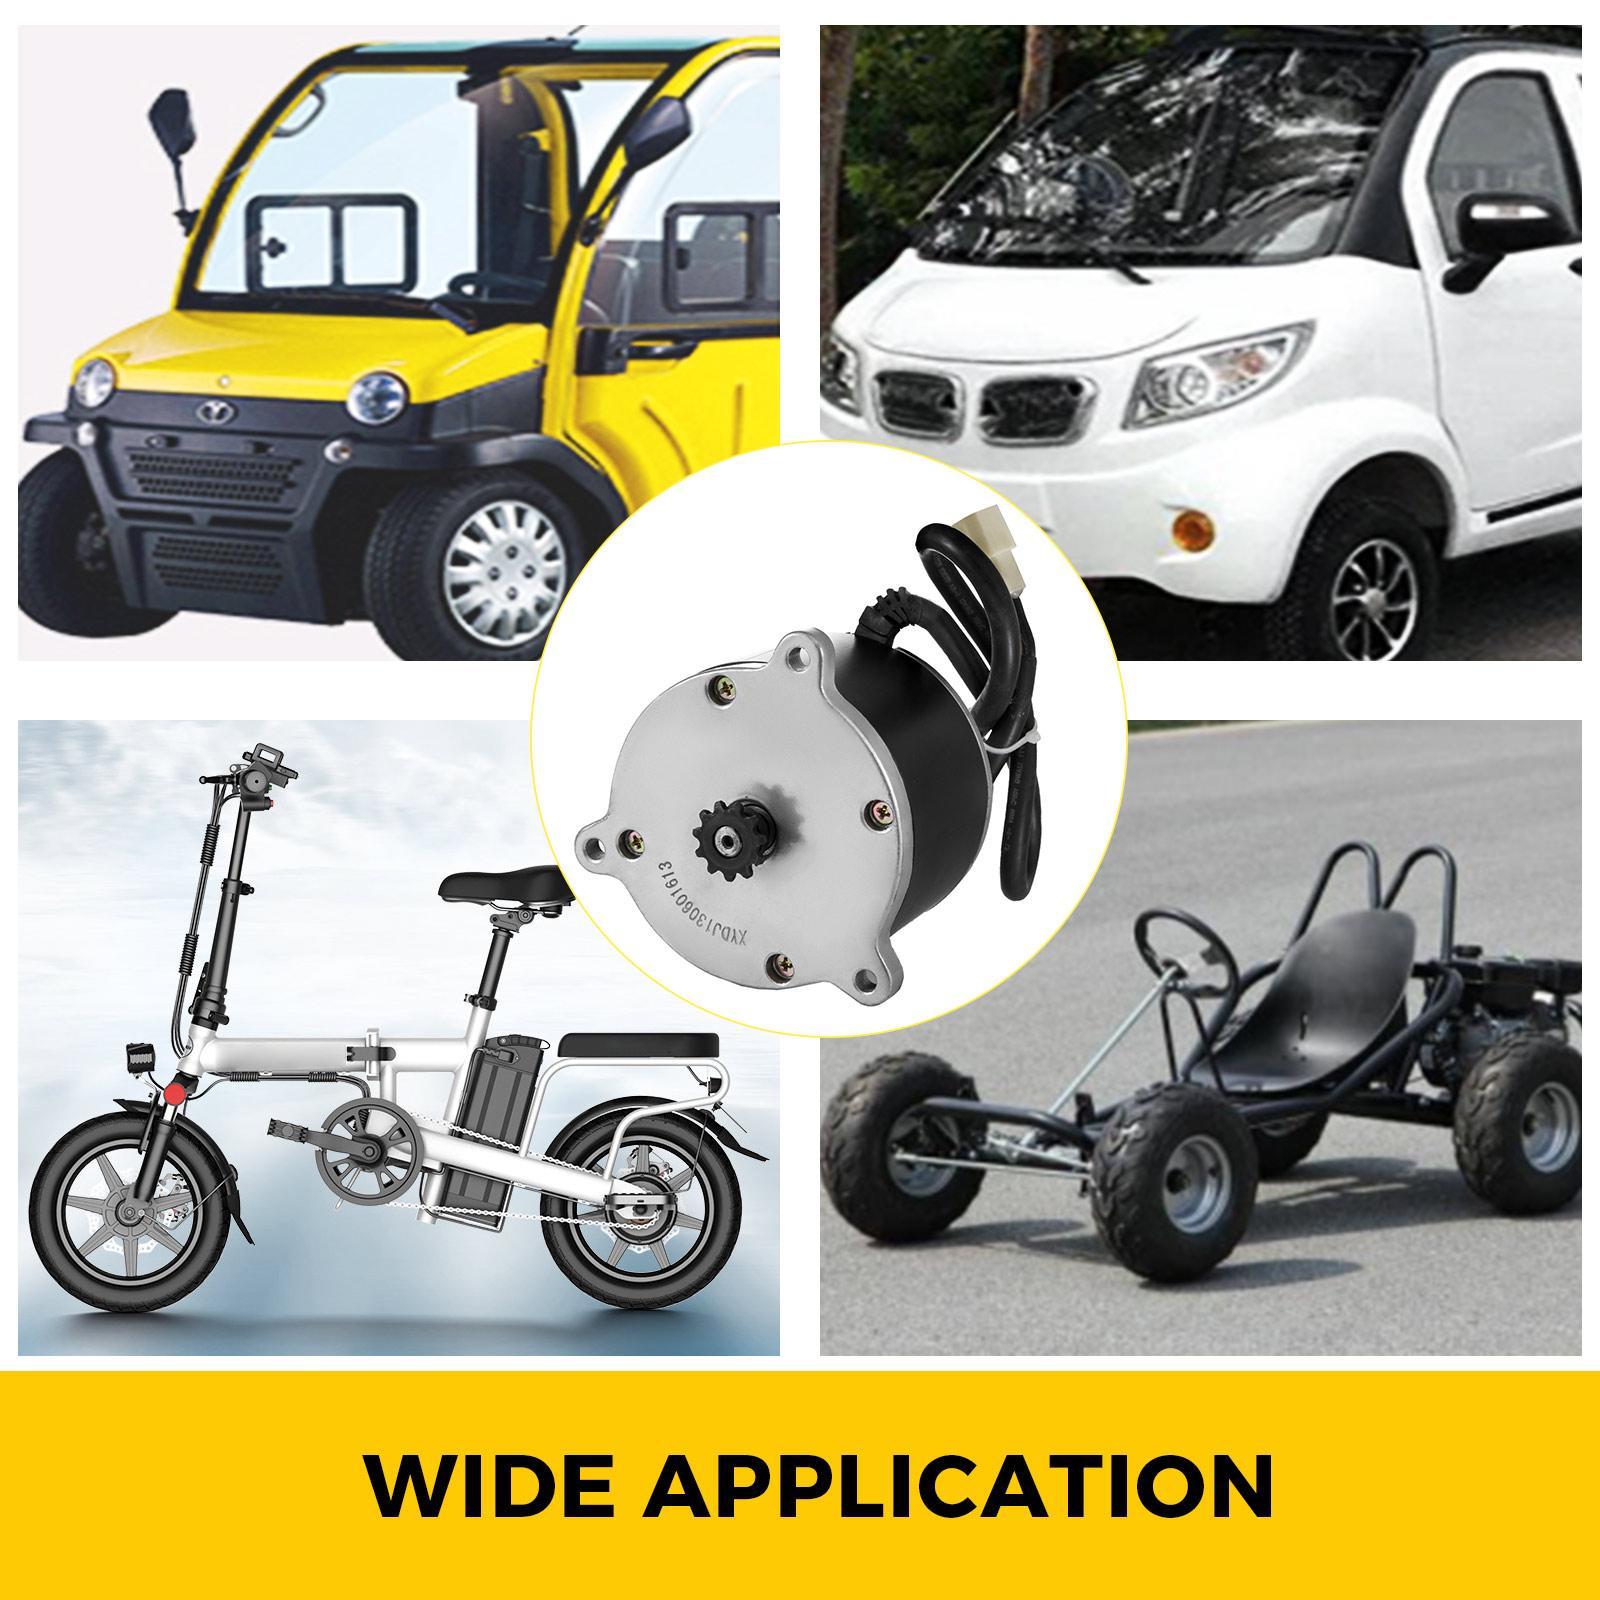 DC-electric-motor-12-60V-150W-2KW-for-scooter-bike-go-kart-minibike-e-ATV thumbnail 43